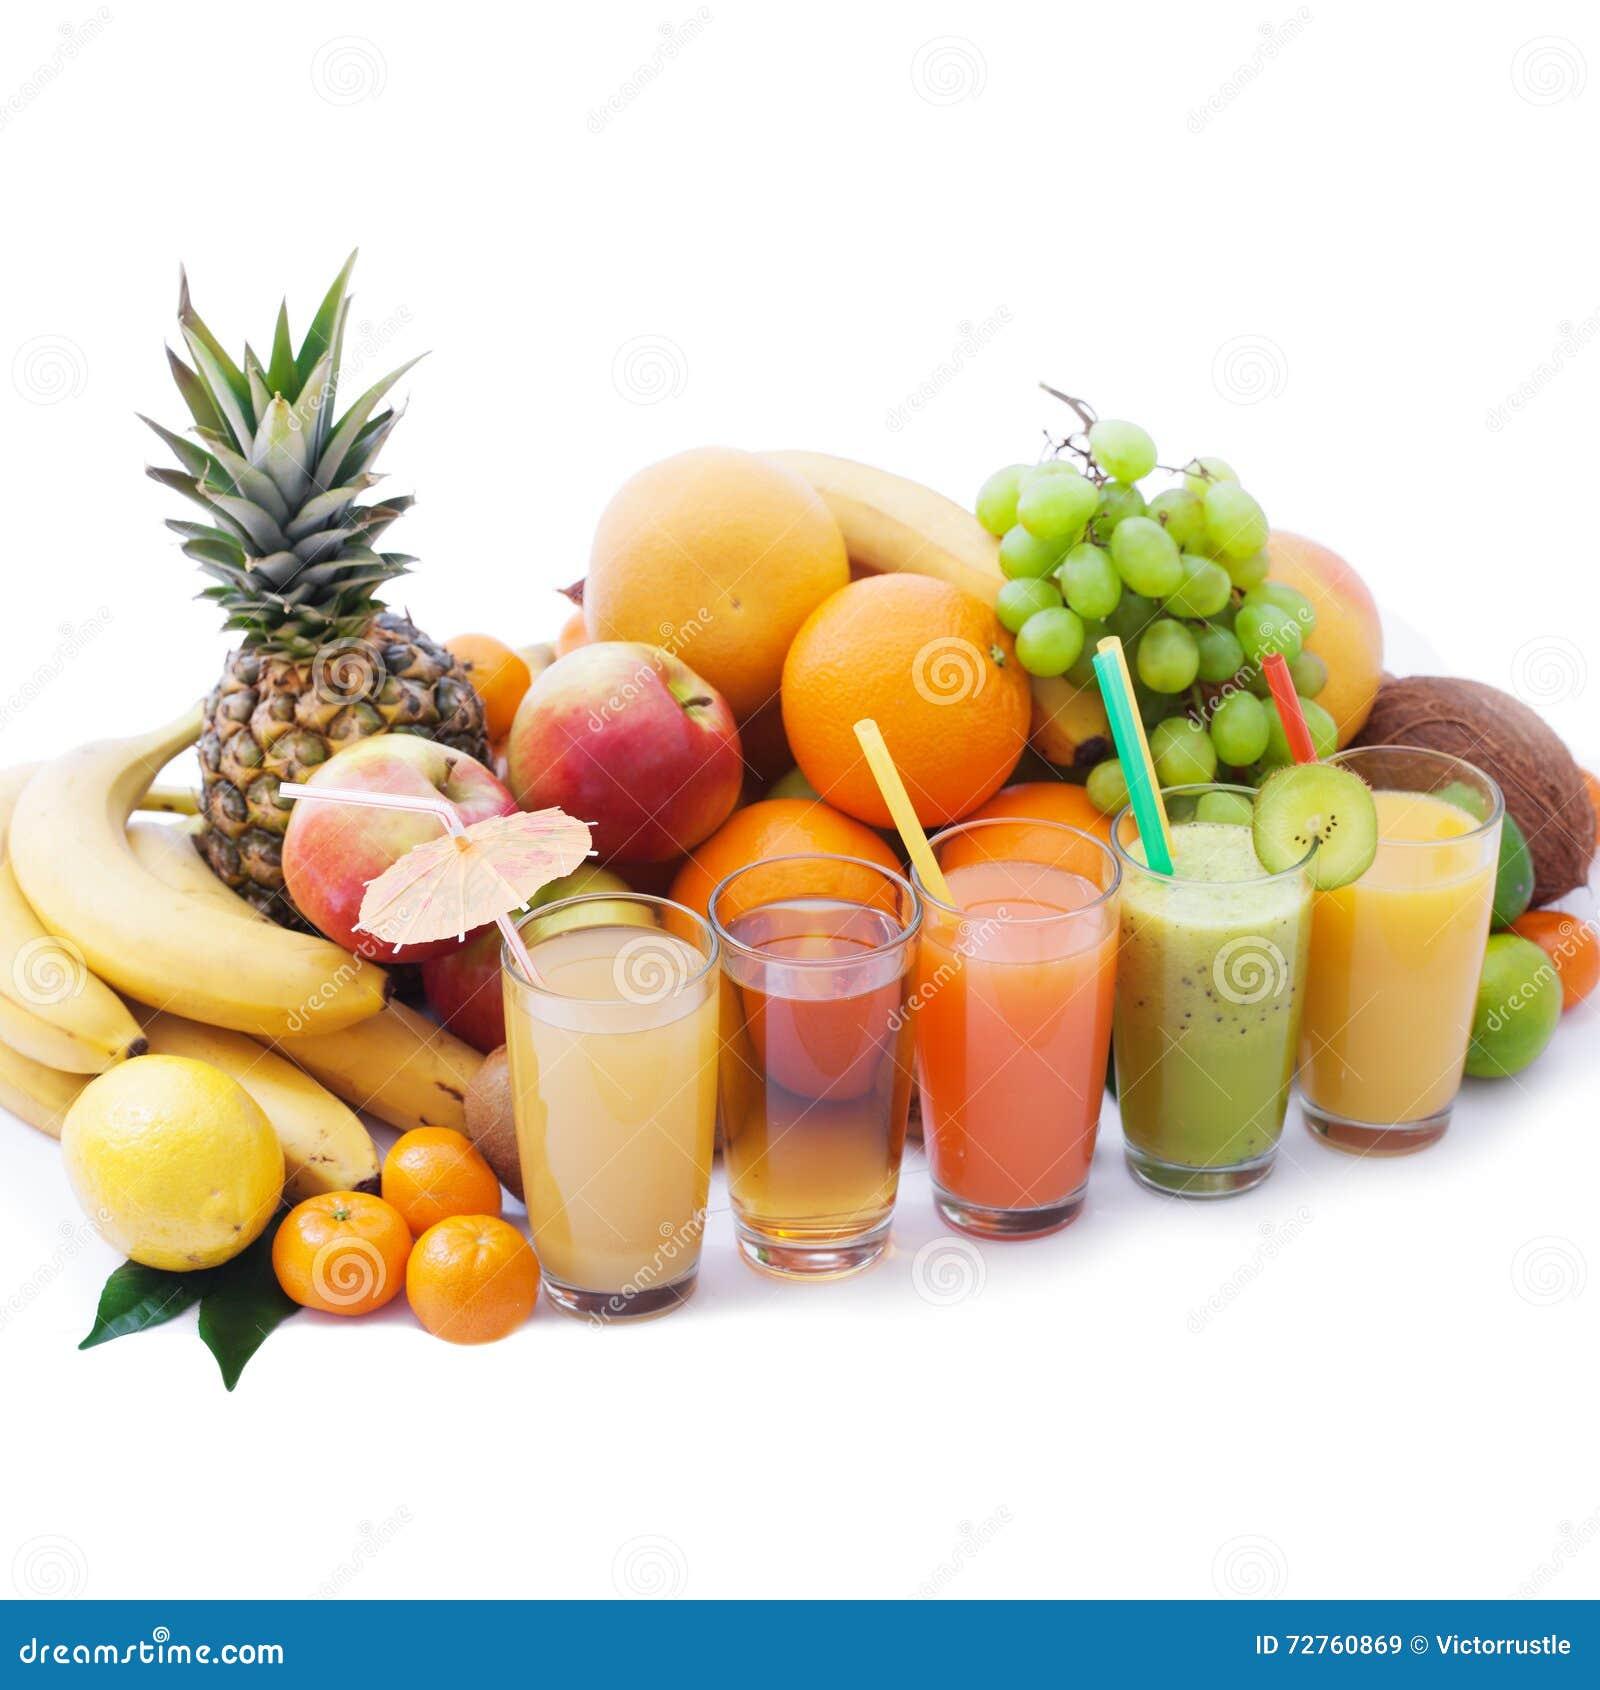 tobacco fruit cools fruit